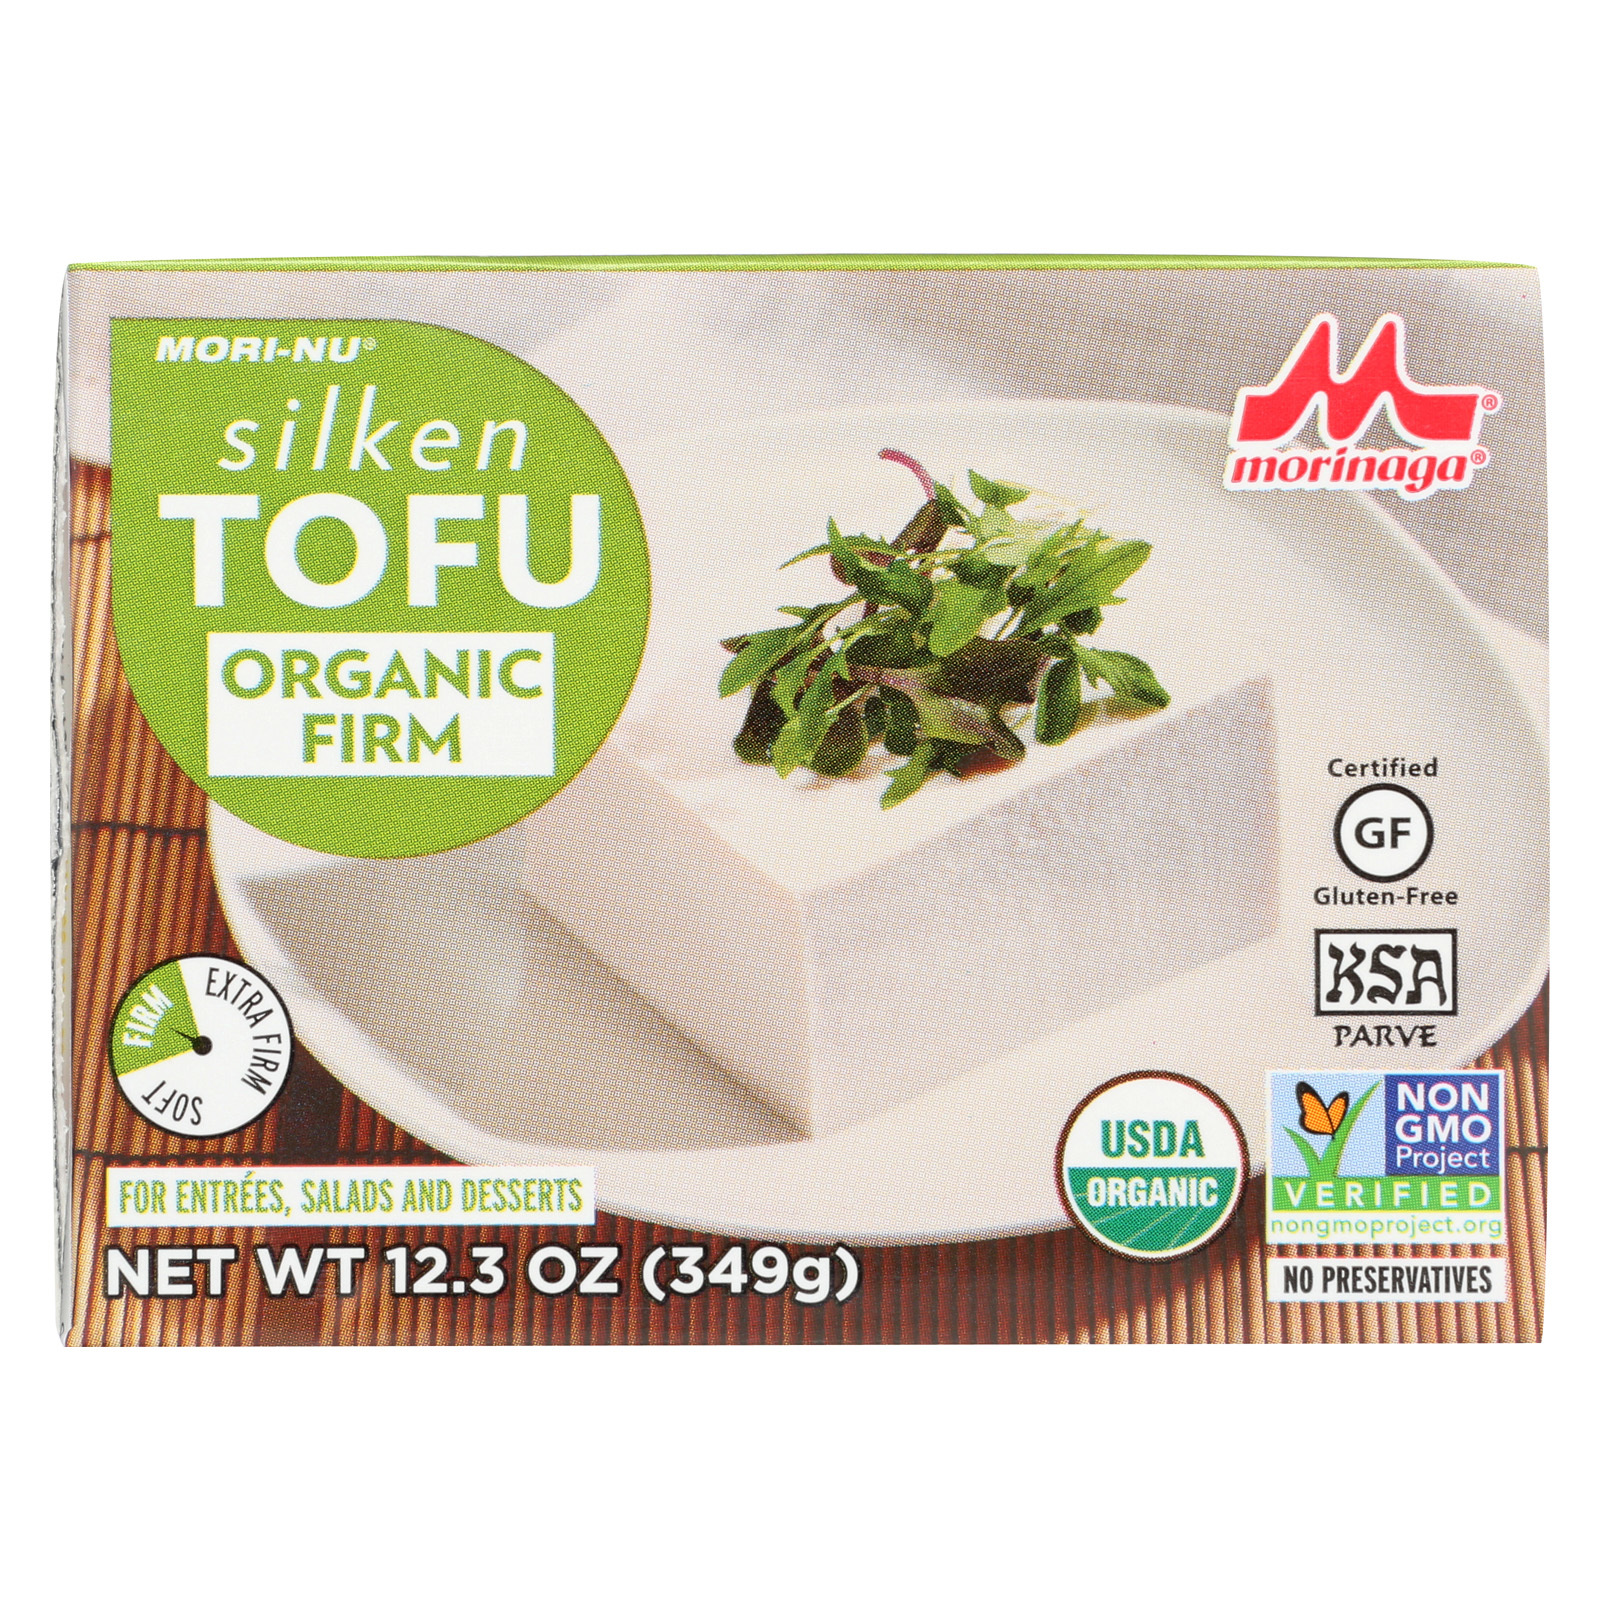 Mori-Nu Silken Tofu - Firm - Case of 12 - 12.3 oz.